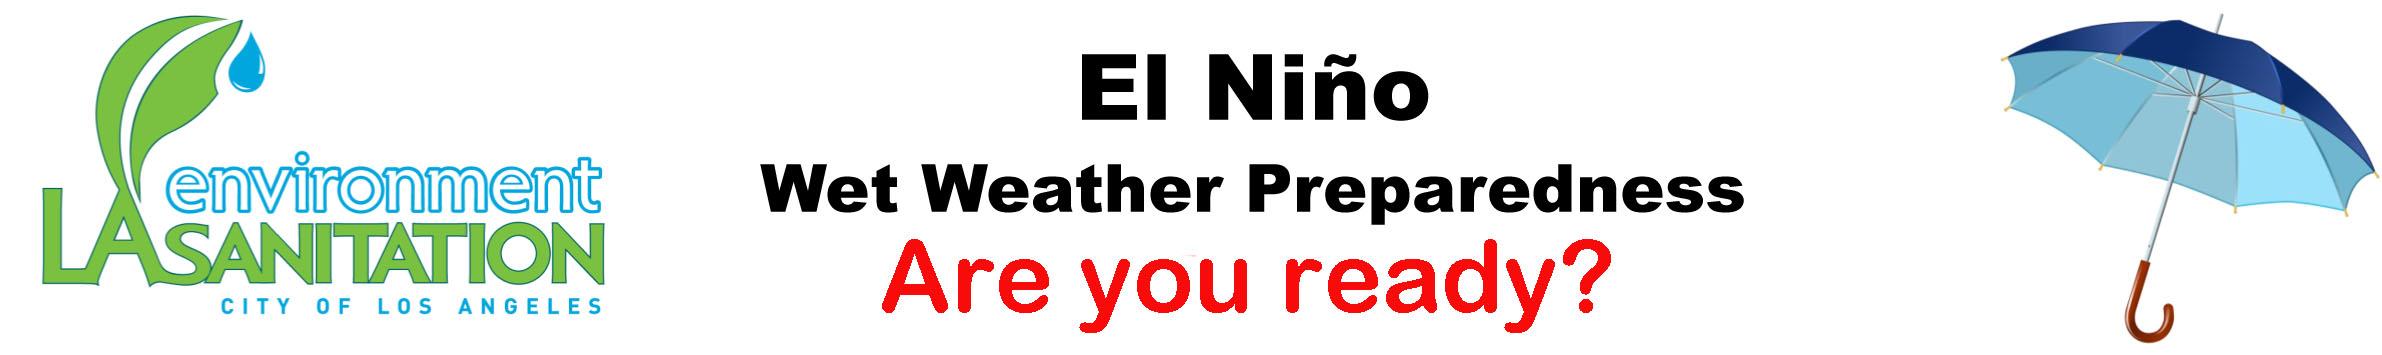 Wet-Weather-Prep-Flyer-LASAN-1